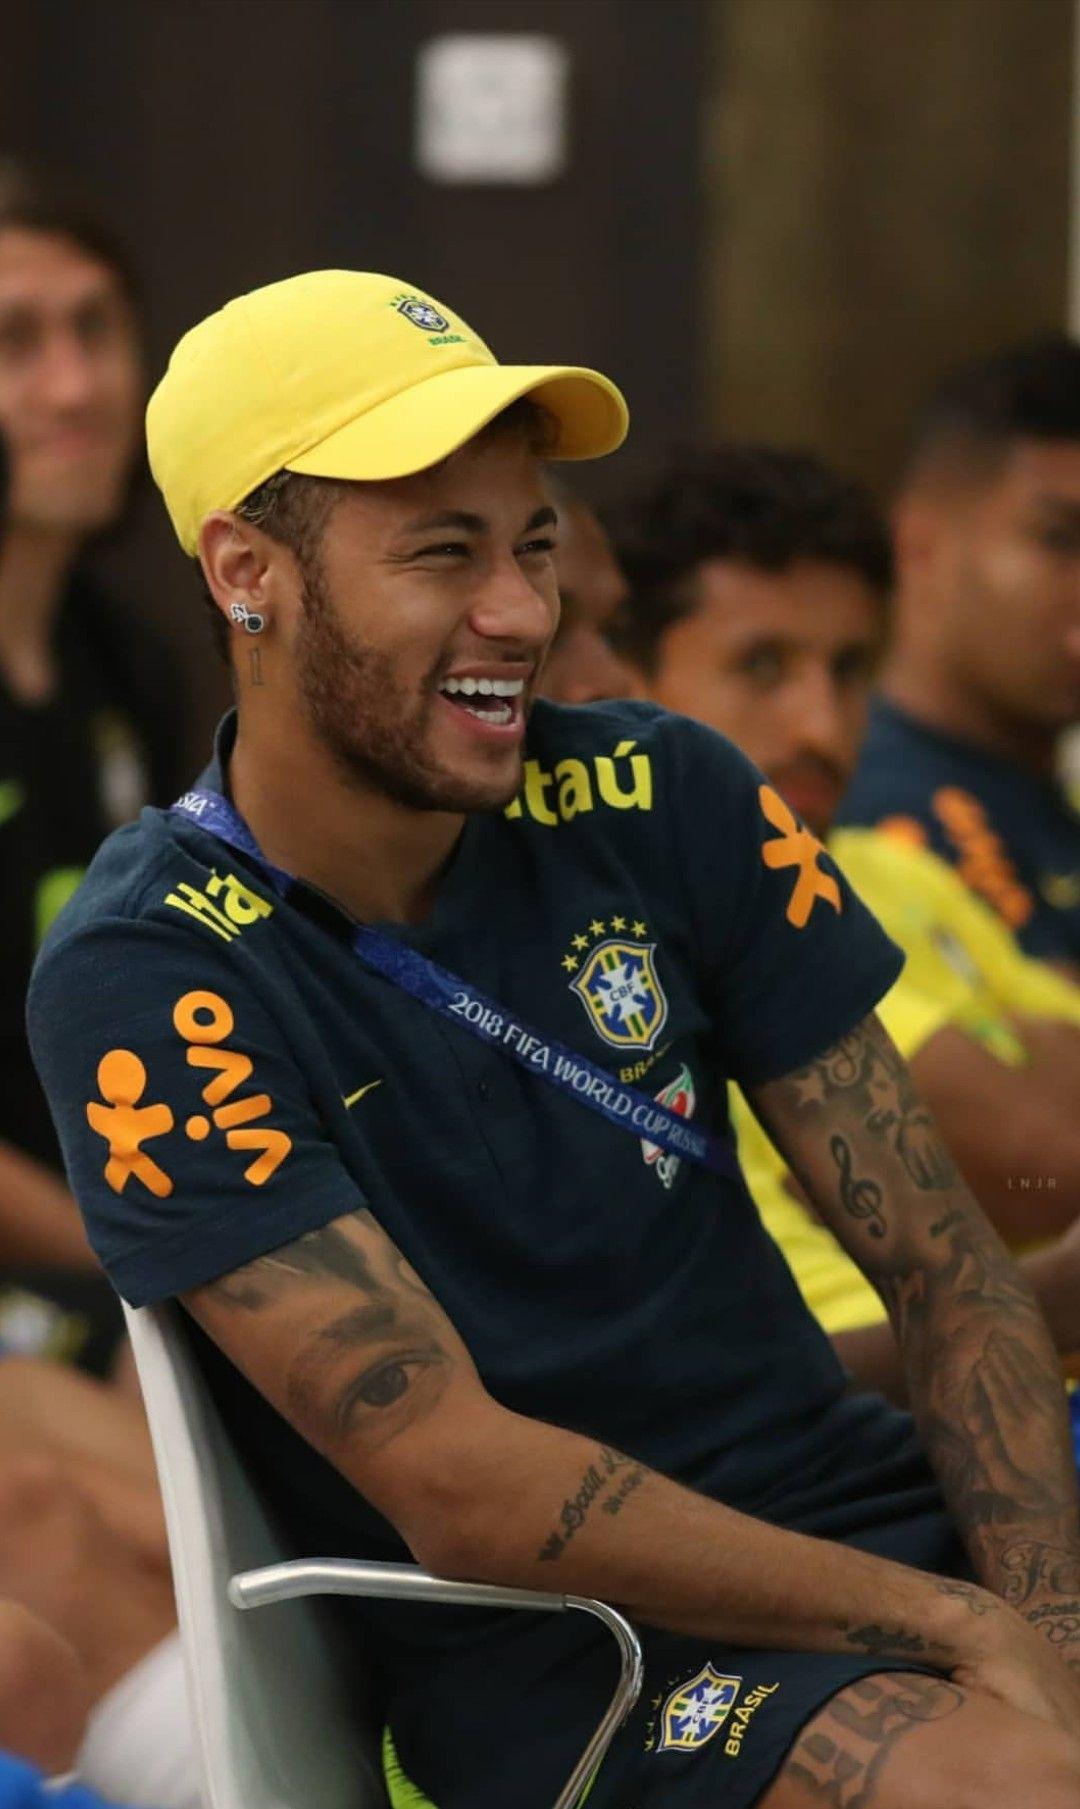 Pin De Amanda Serrato Azevedo Em Neymar Jr Neymar Jr Selecao Brasileira Masculina Futebol Neymar